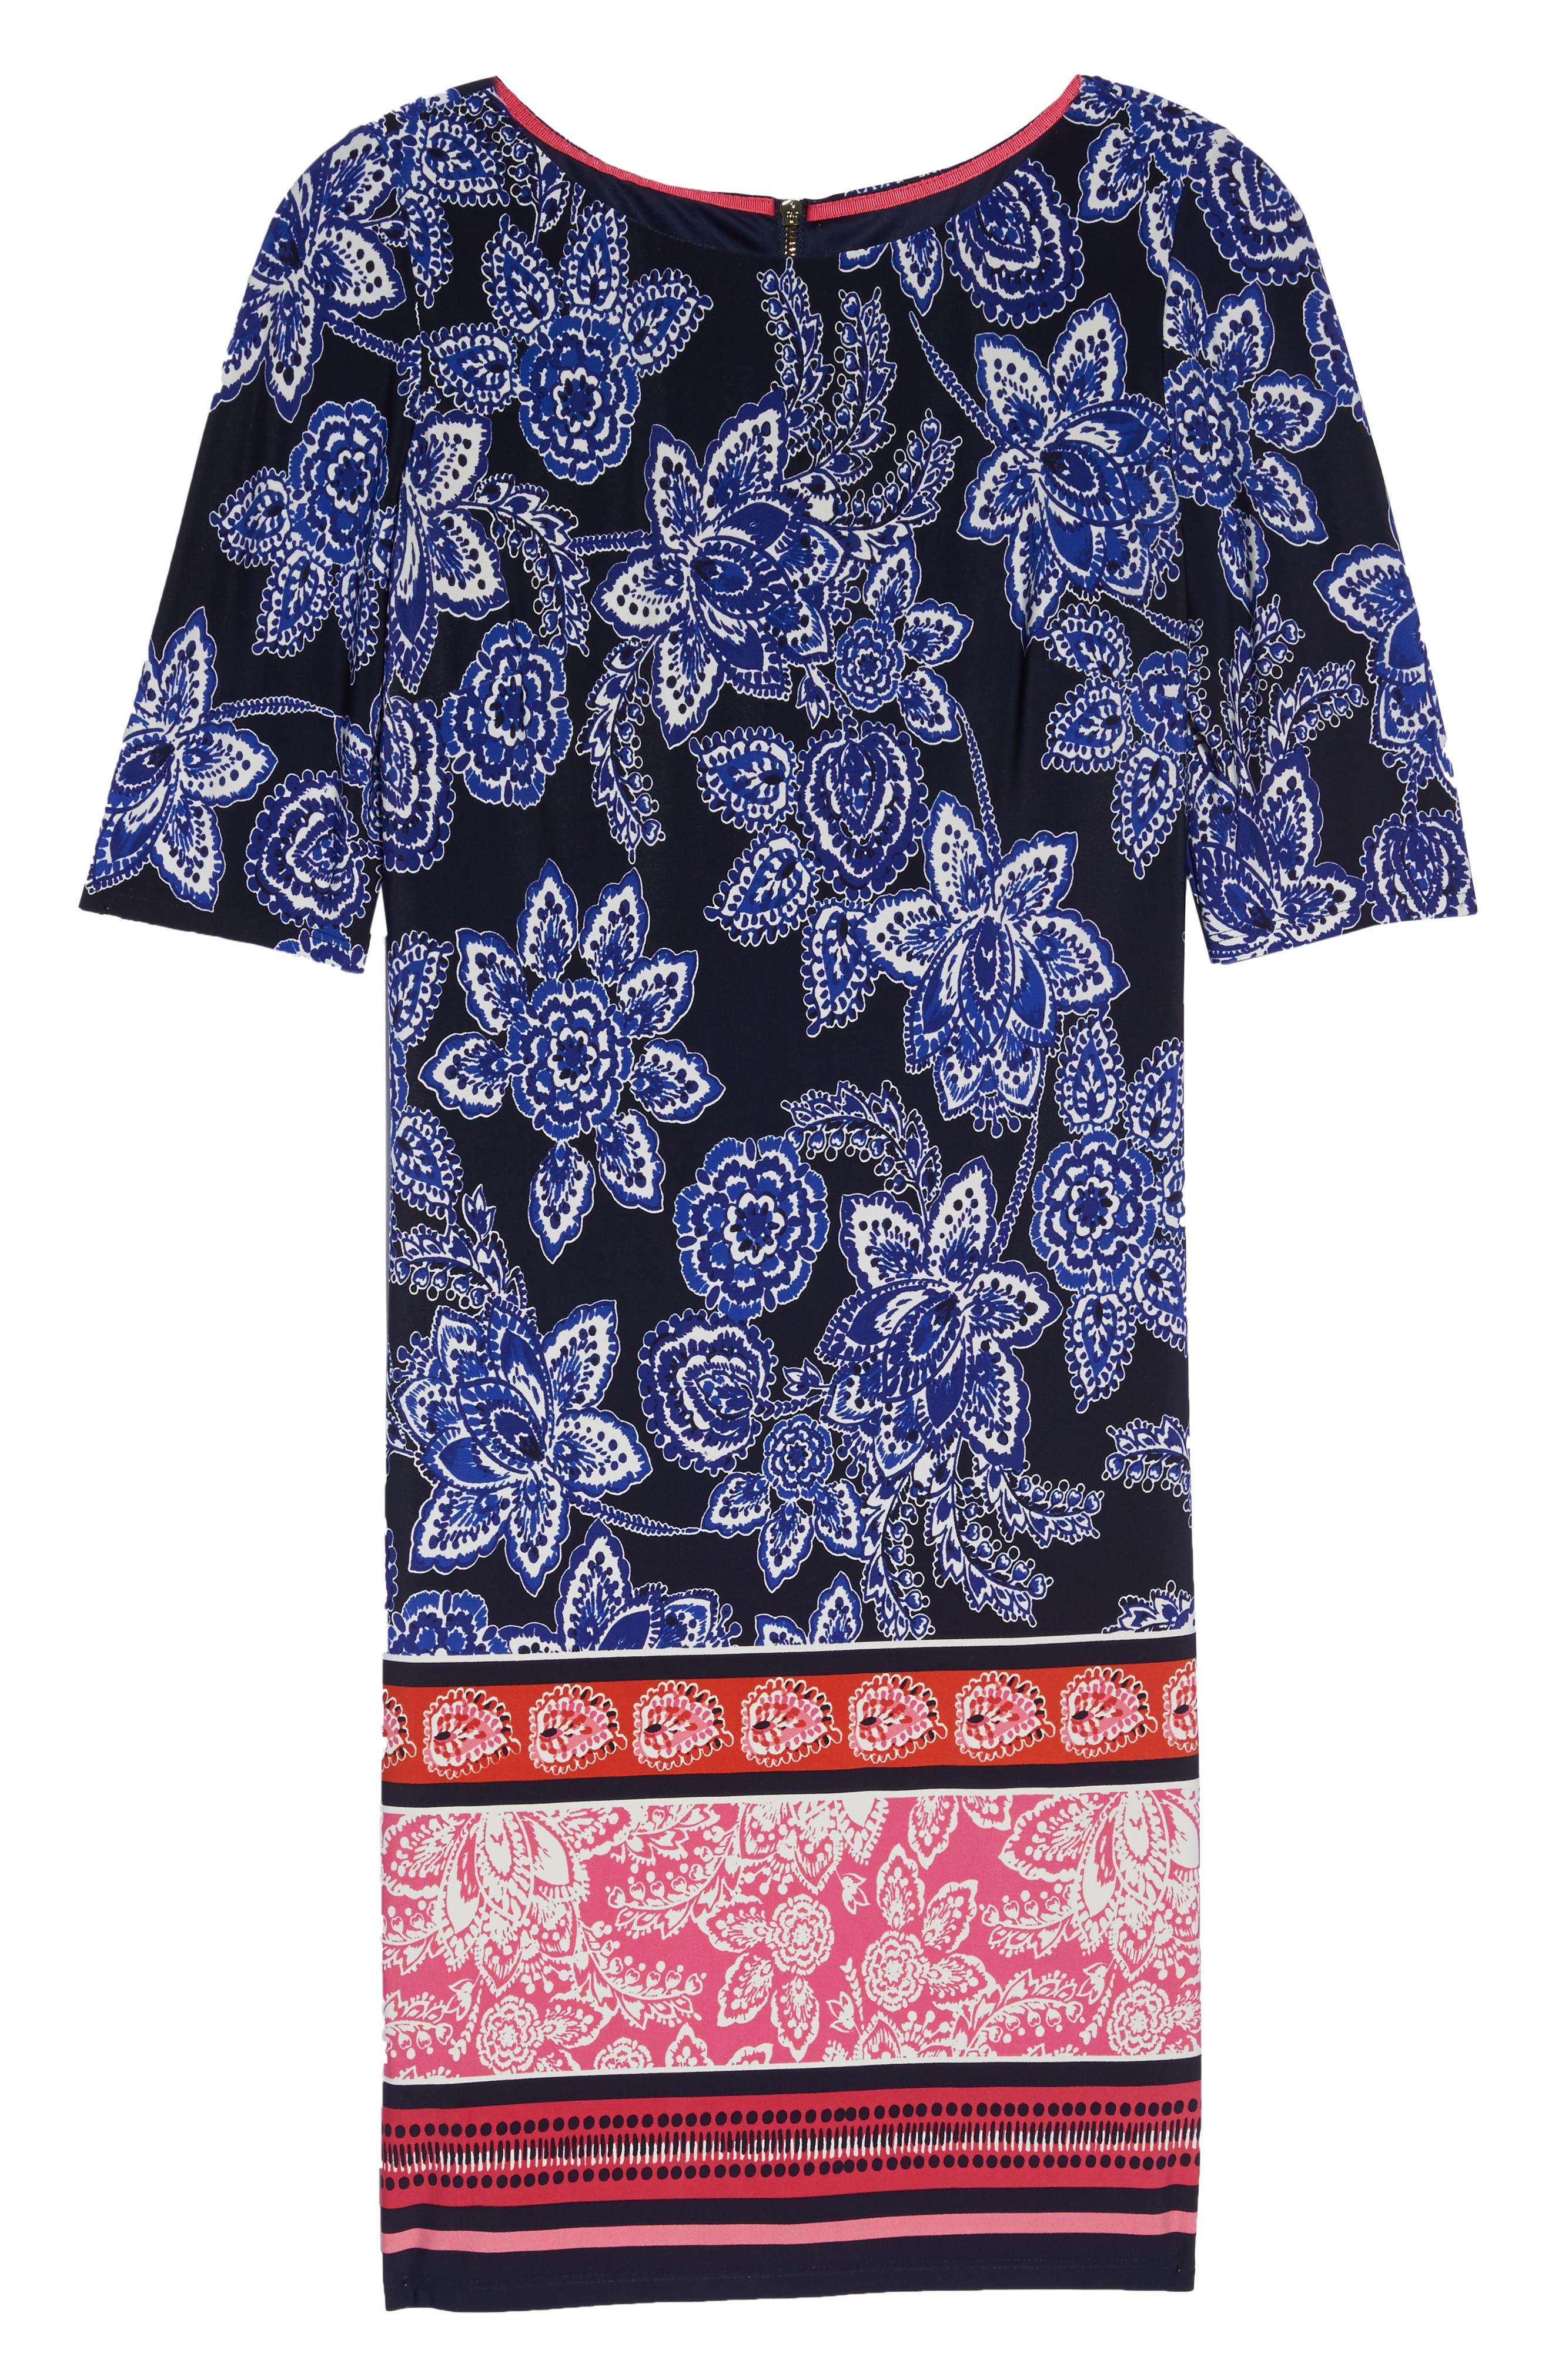 Print Shift Dress,                             Alternate thumbnail 6, color,                             Navy/ Pink/ Orange